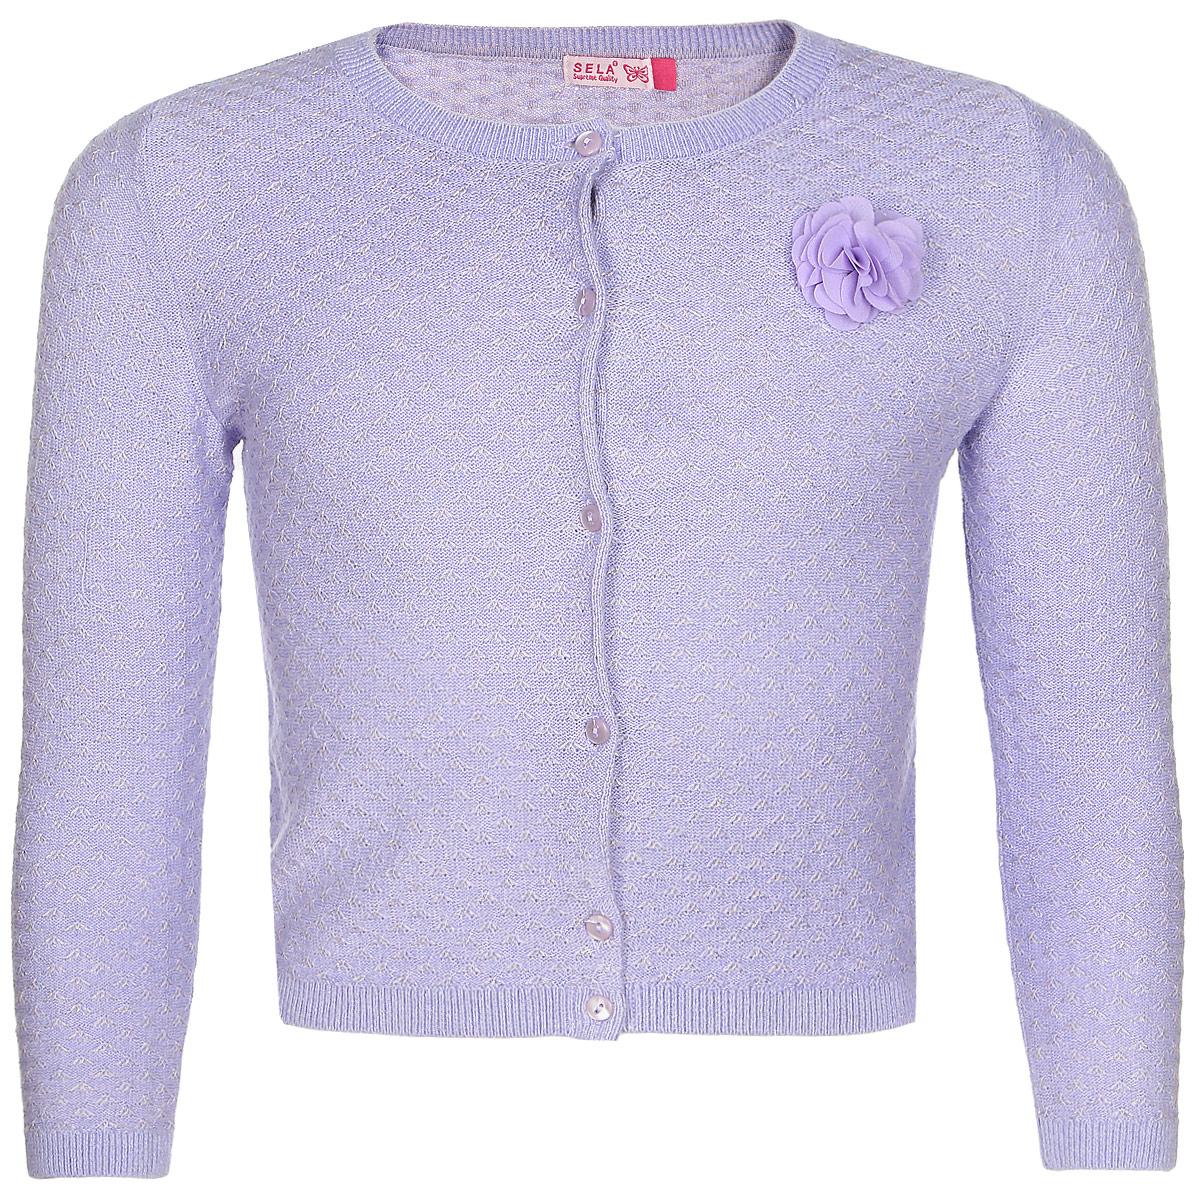 Кофта для девочки Sela, цвет: сиреневый. CN-514/275-7321. Размер 116 ruffle neckline and cuff blouse